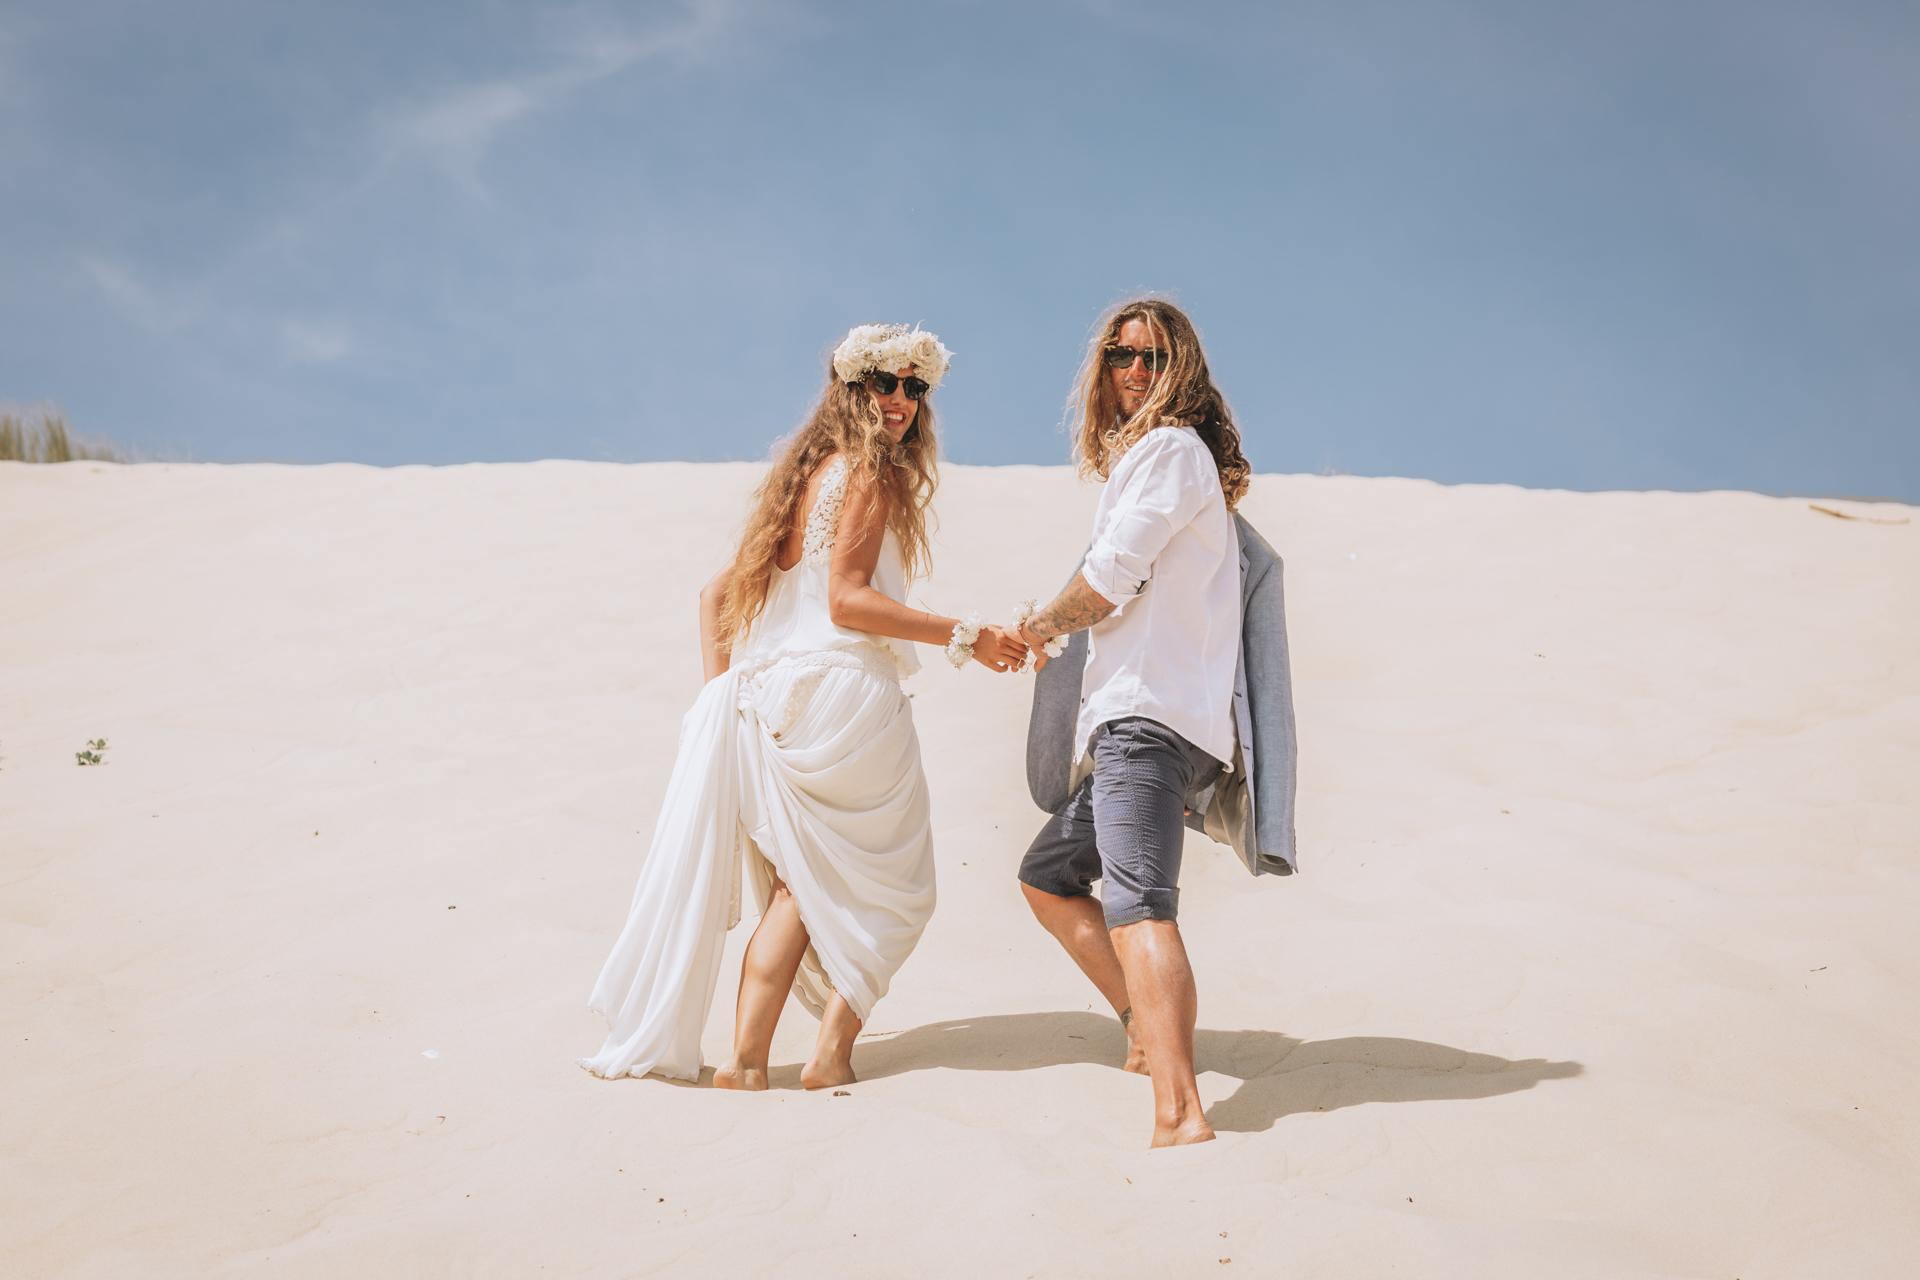 fotografo de bodas donostia boda surfera